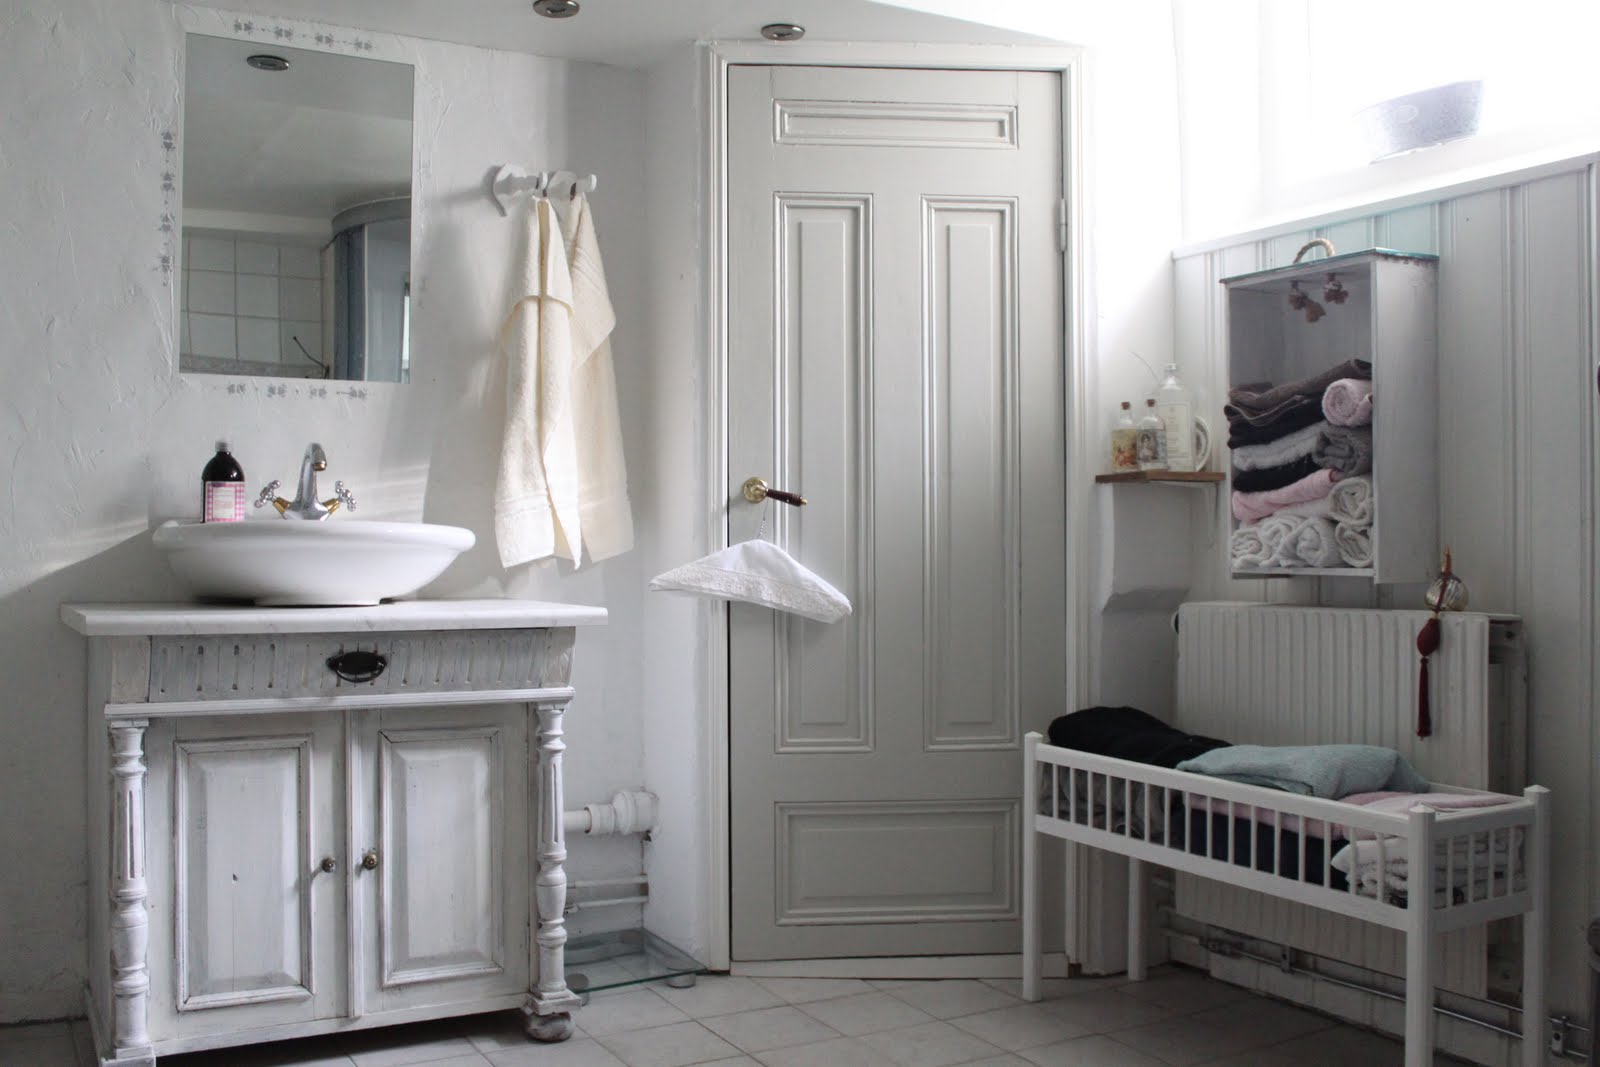 Fint hemma: forts badrum